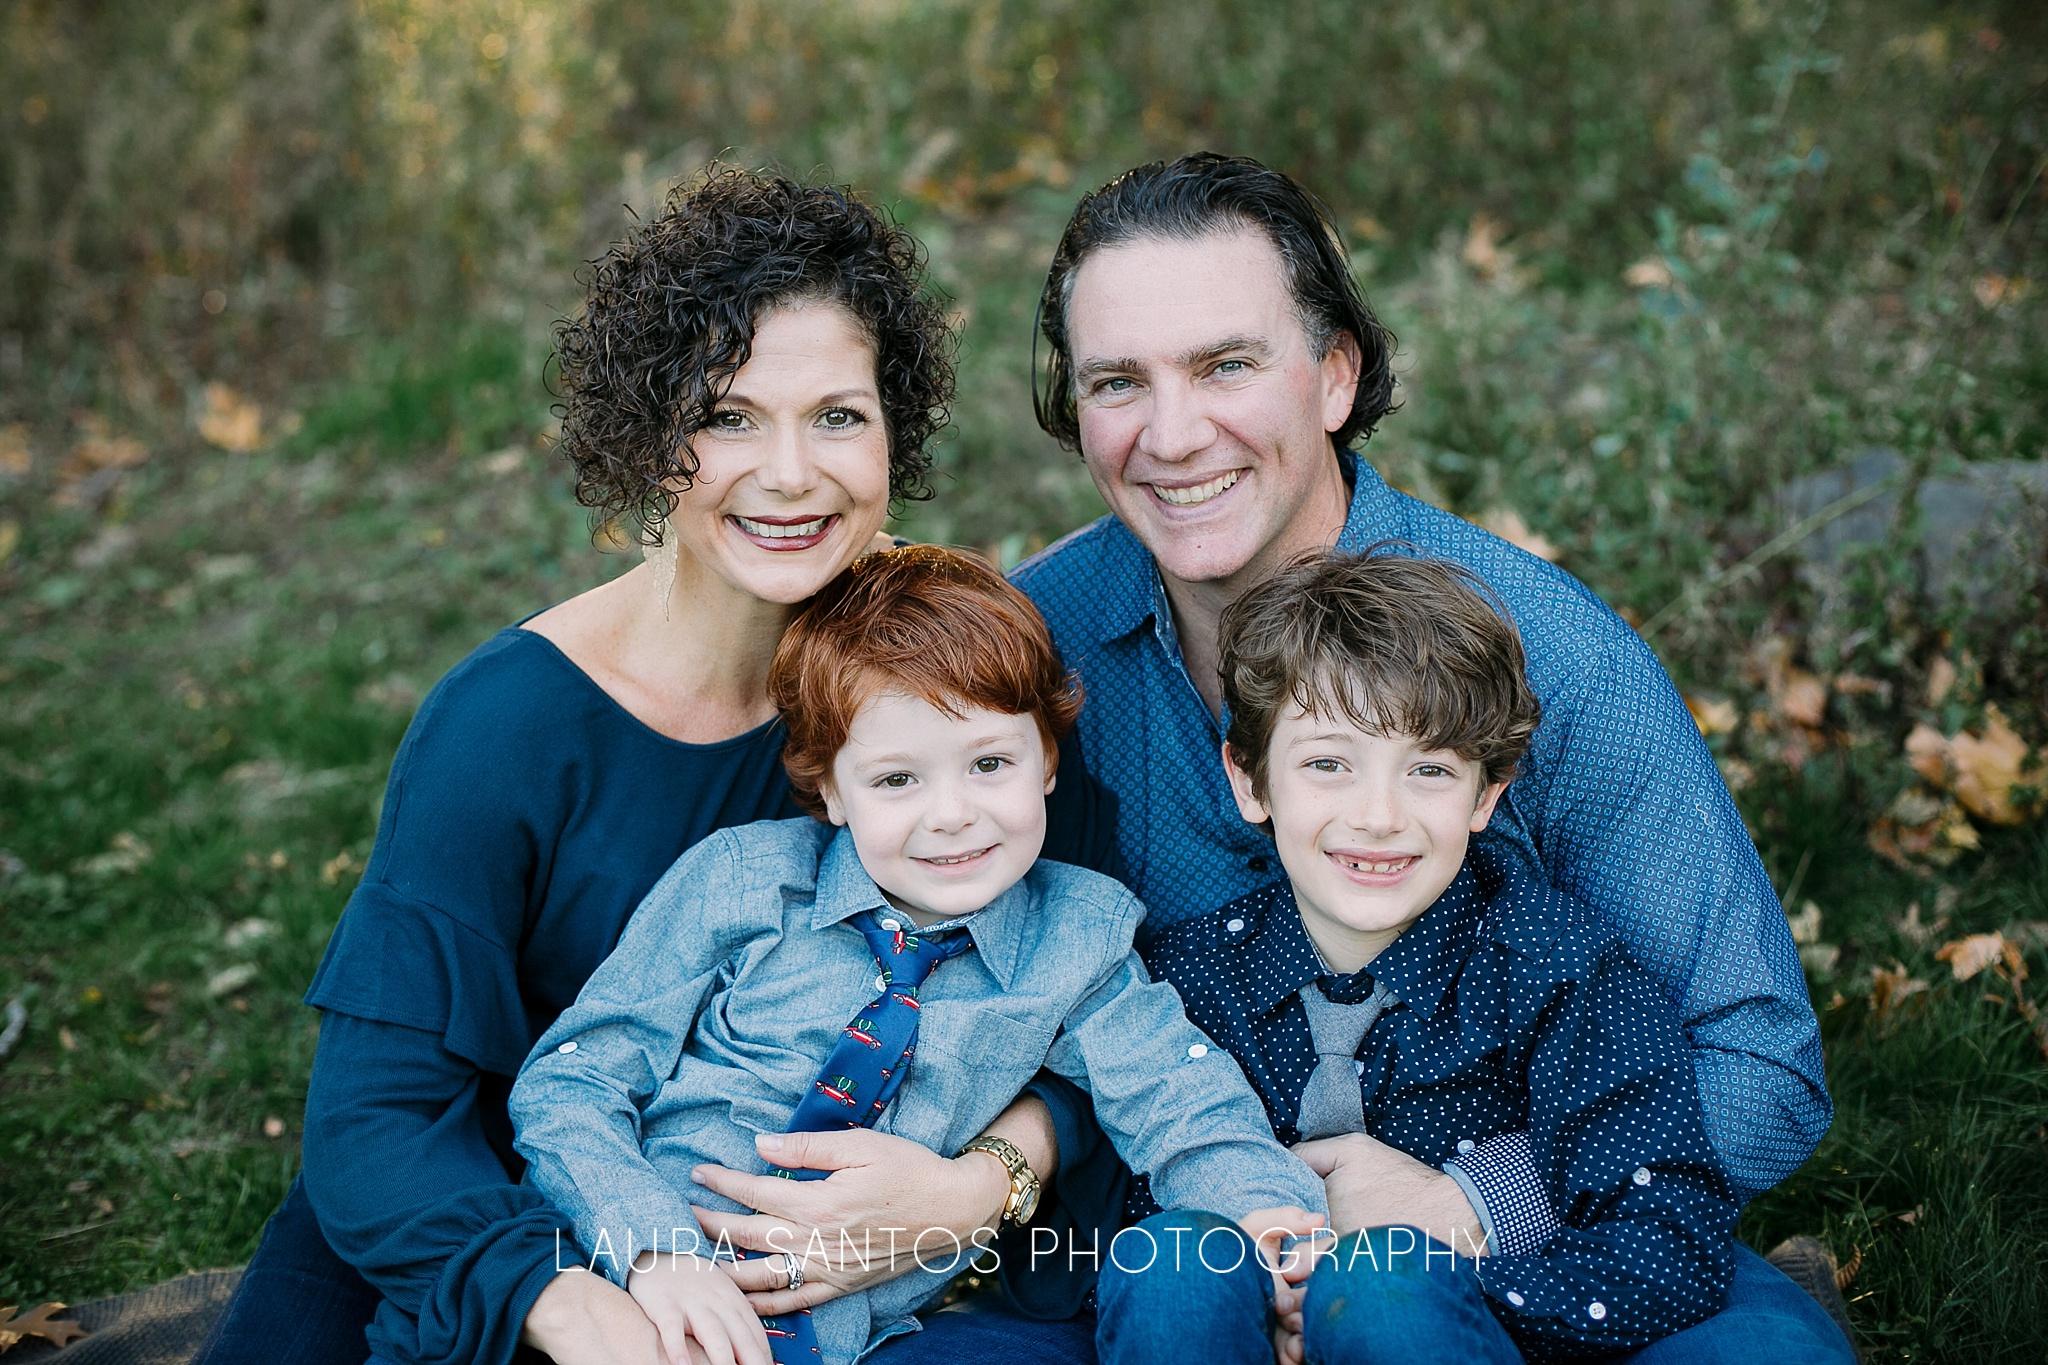 Laura Santos Photography Portland Oregon Family Photographer_0472.jpg